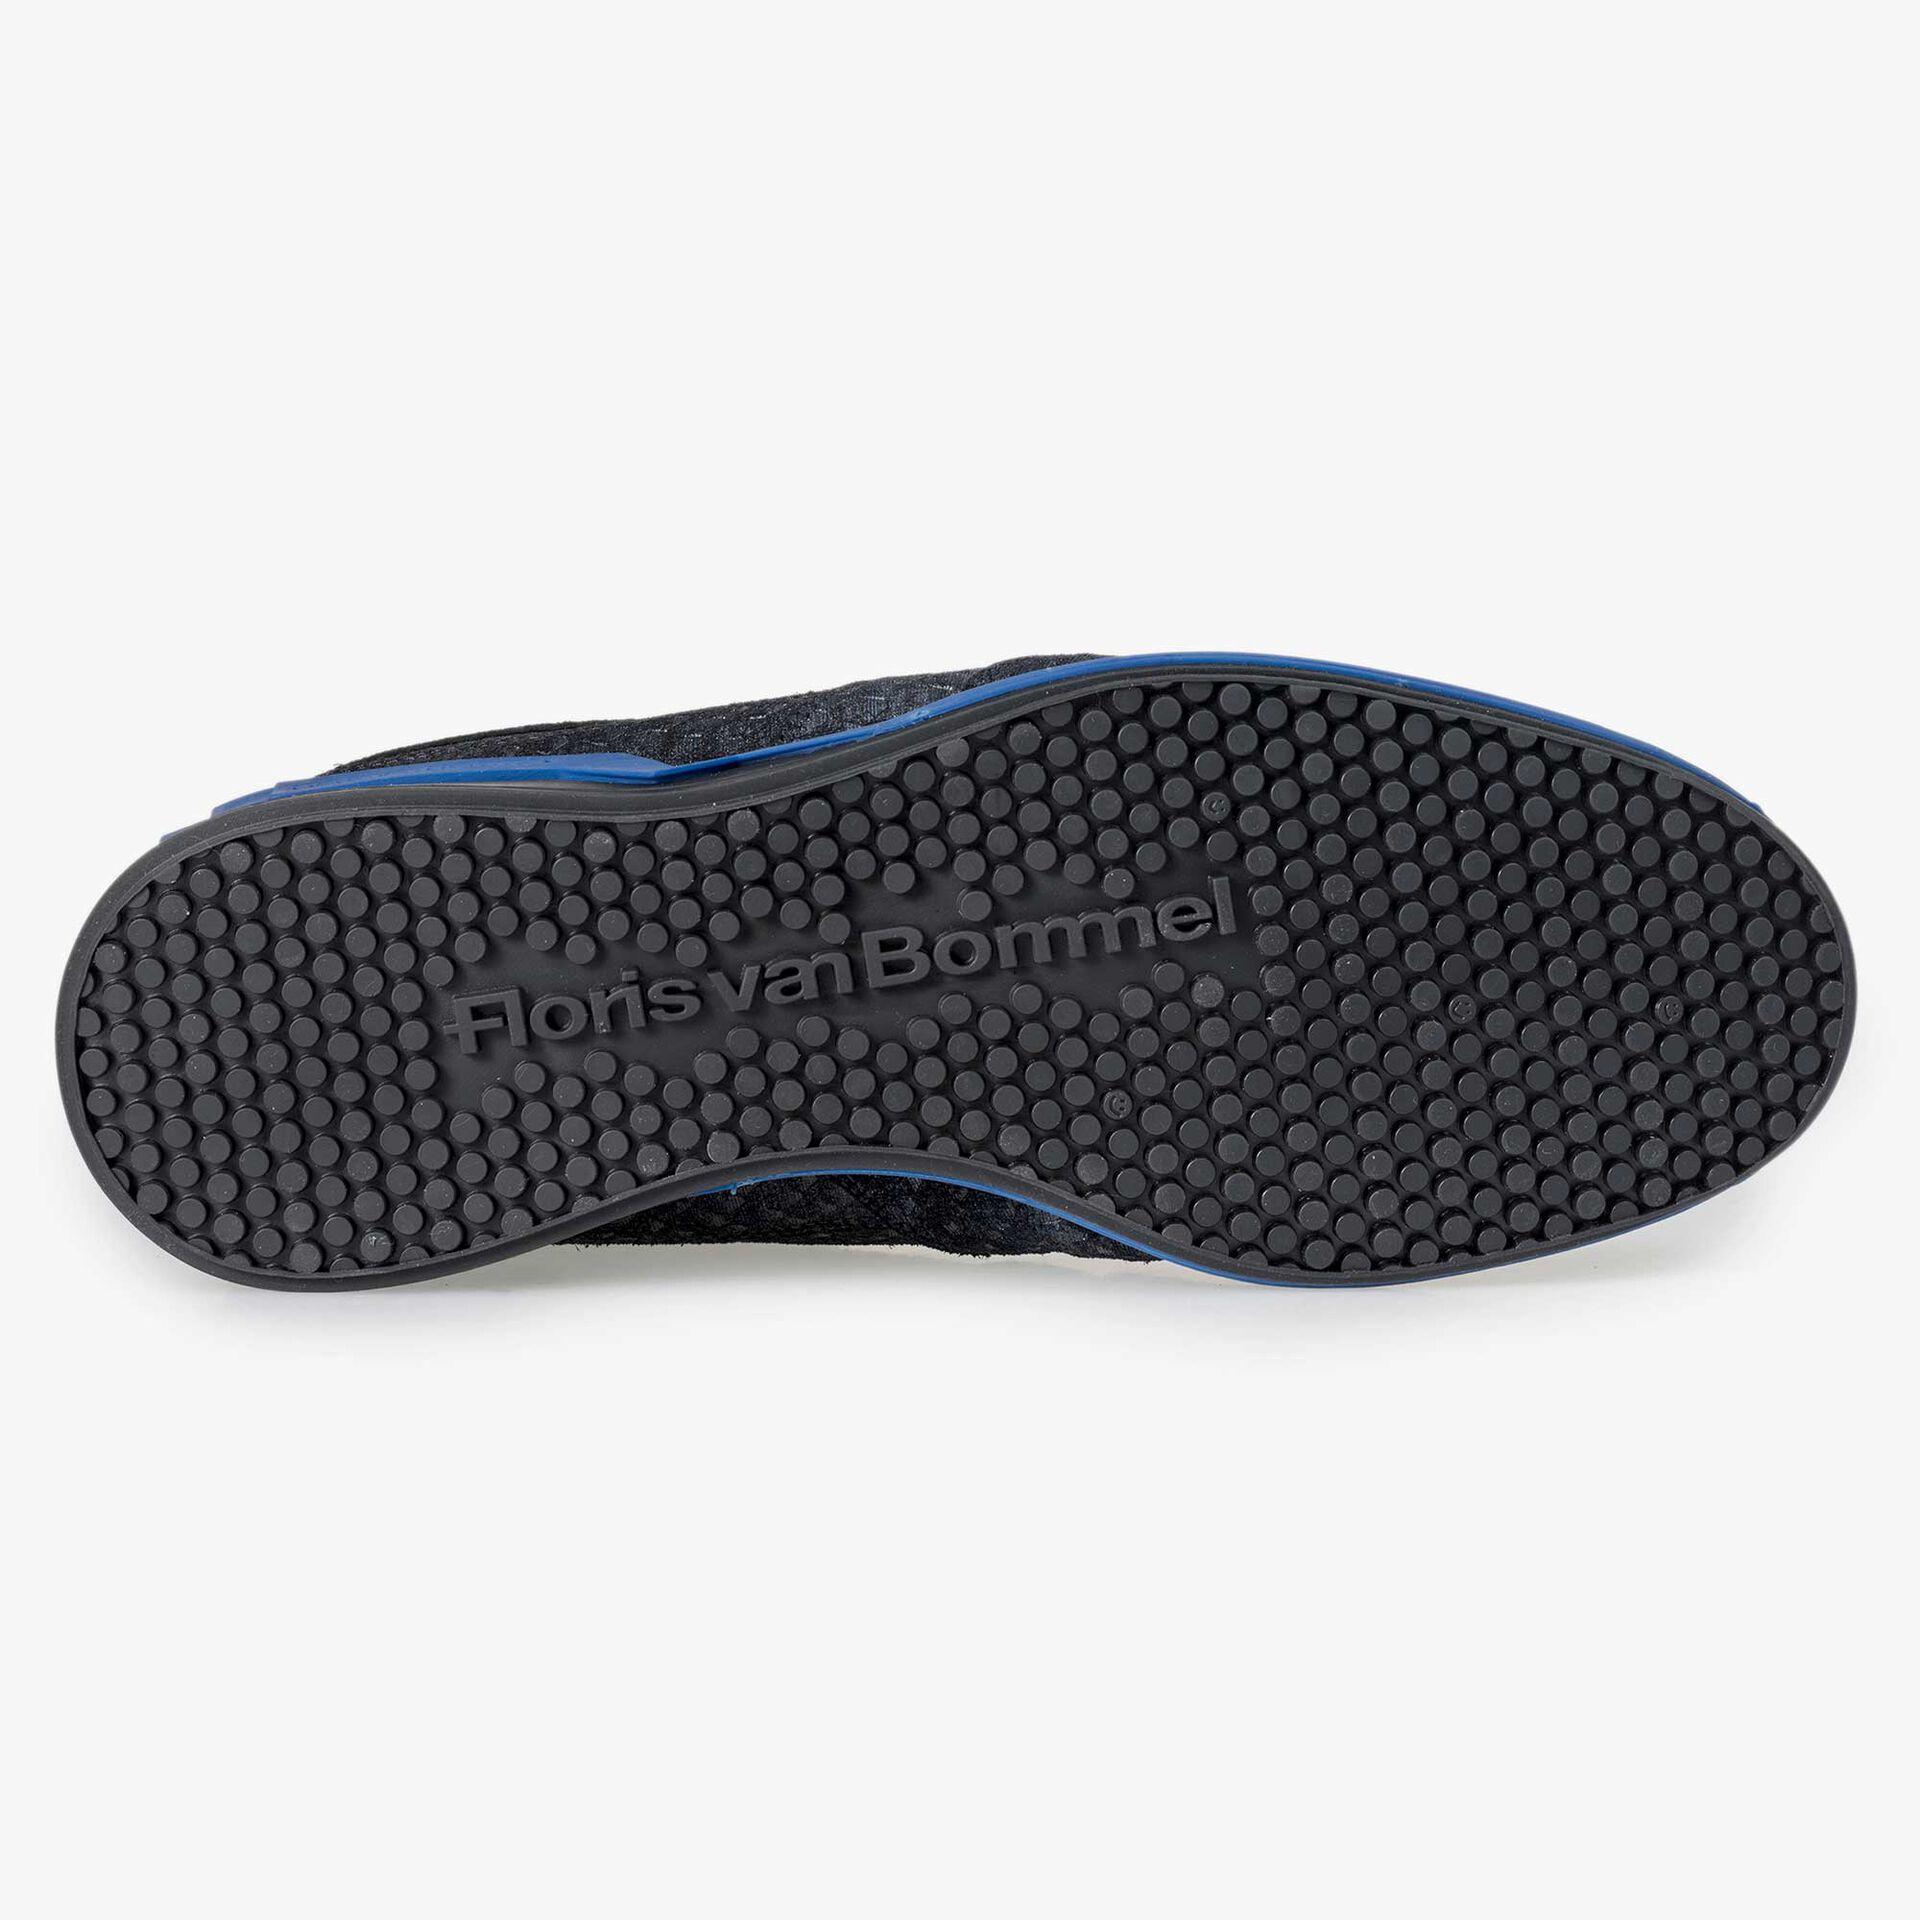 Floris van Bommel blauwe suède snakeprint sneaker